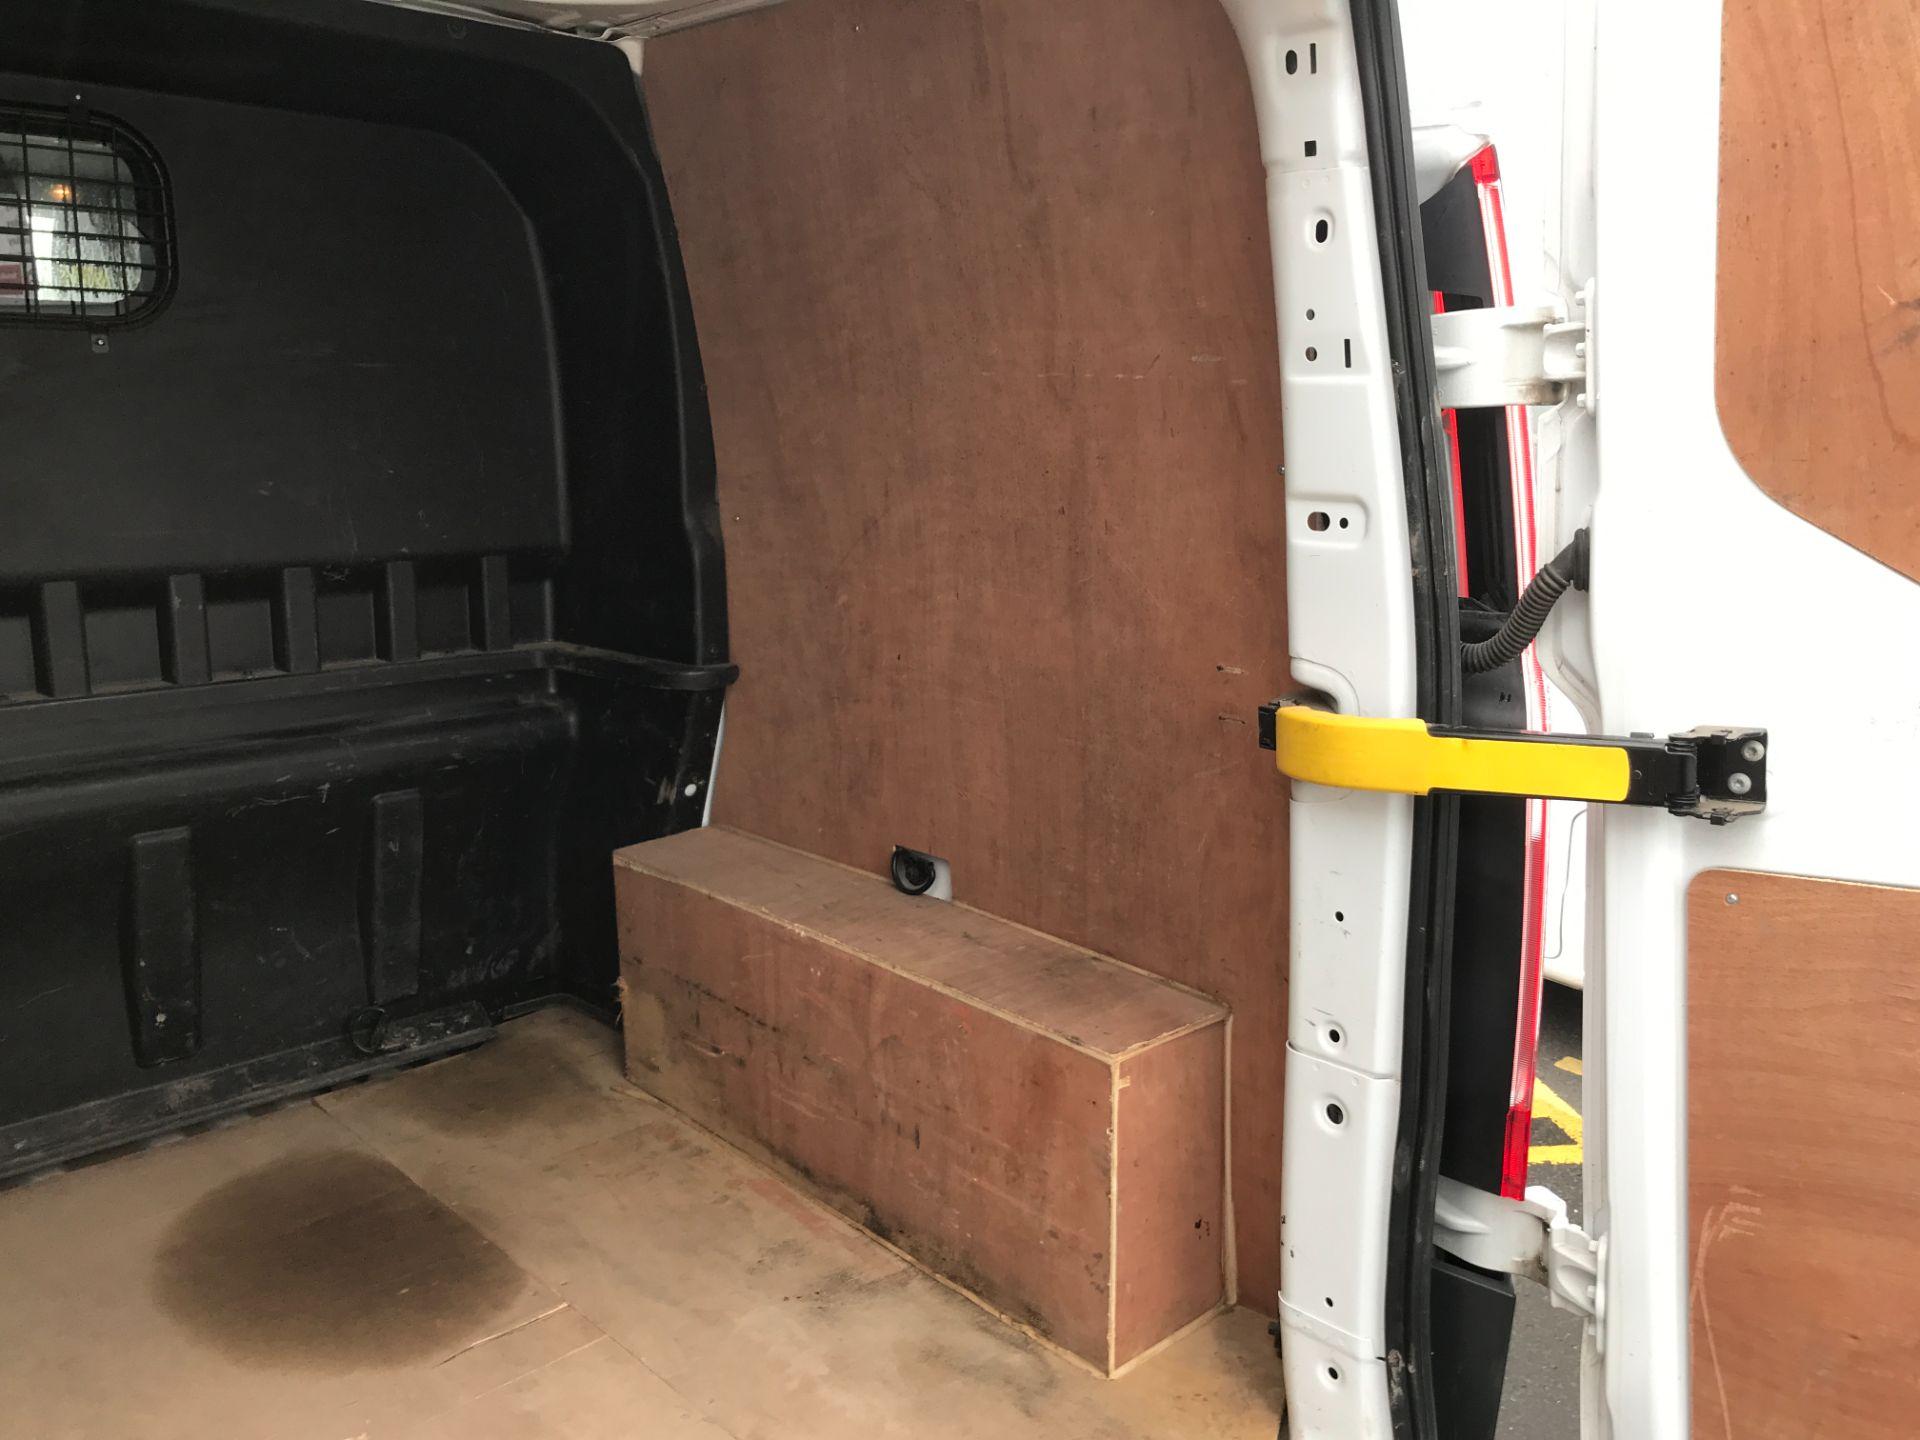 2017 Ford Transit Custom 290 L1 2.0TDCI 105PS LOW ROOF EURO 6 DOUBLE CAB (FE17VJX) Image 10